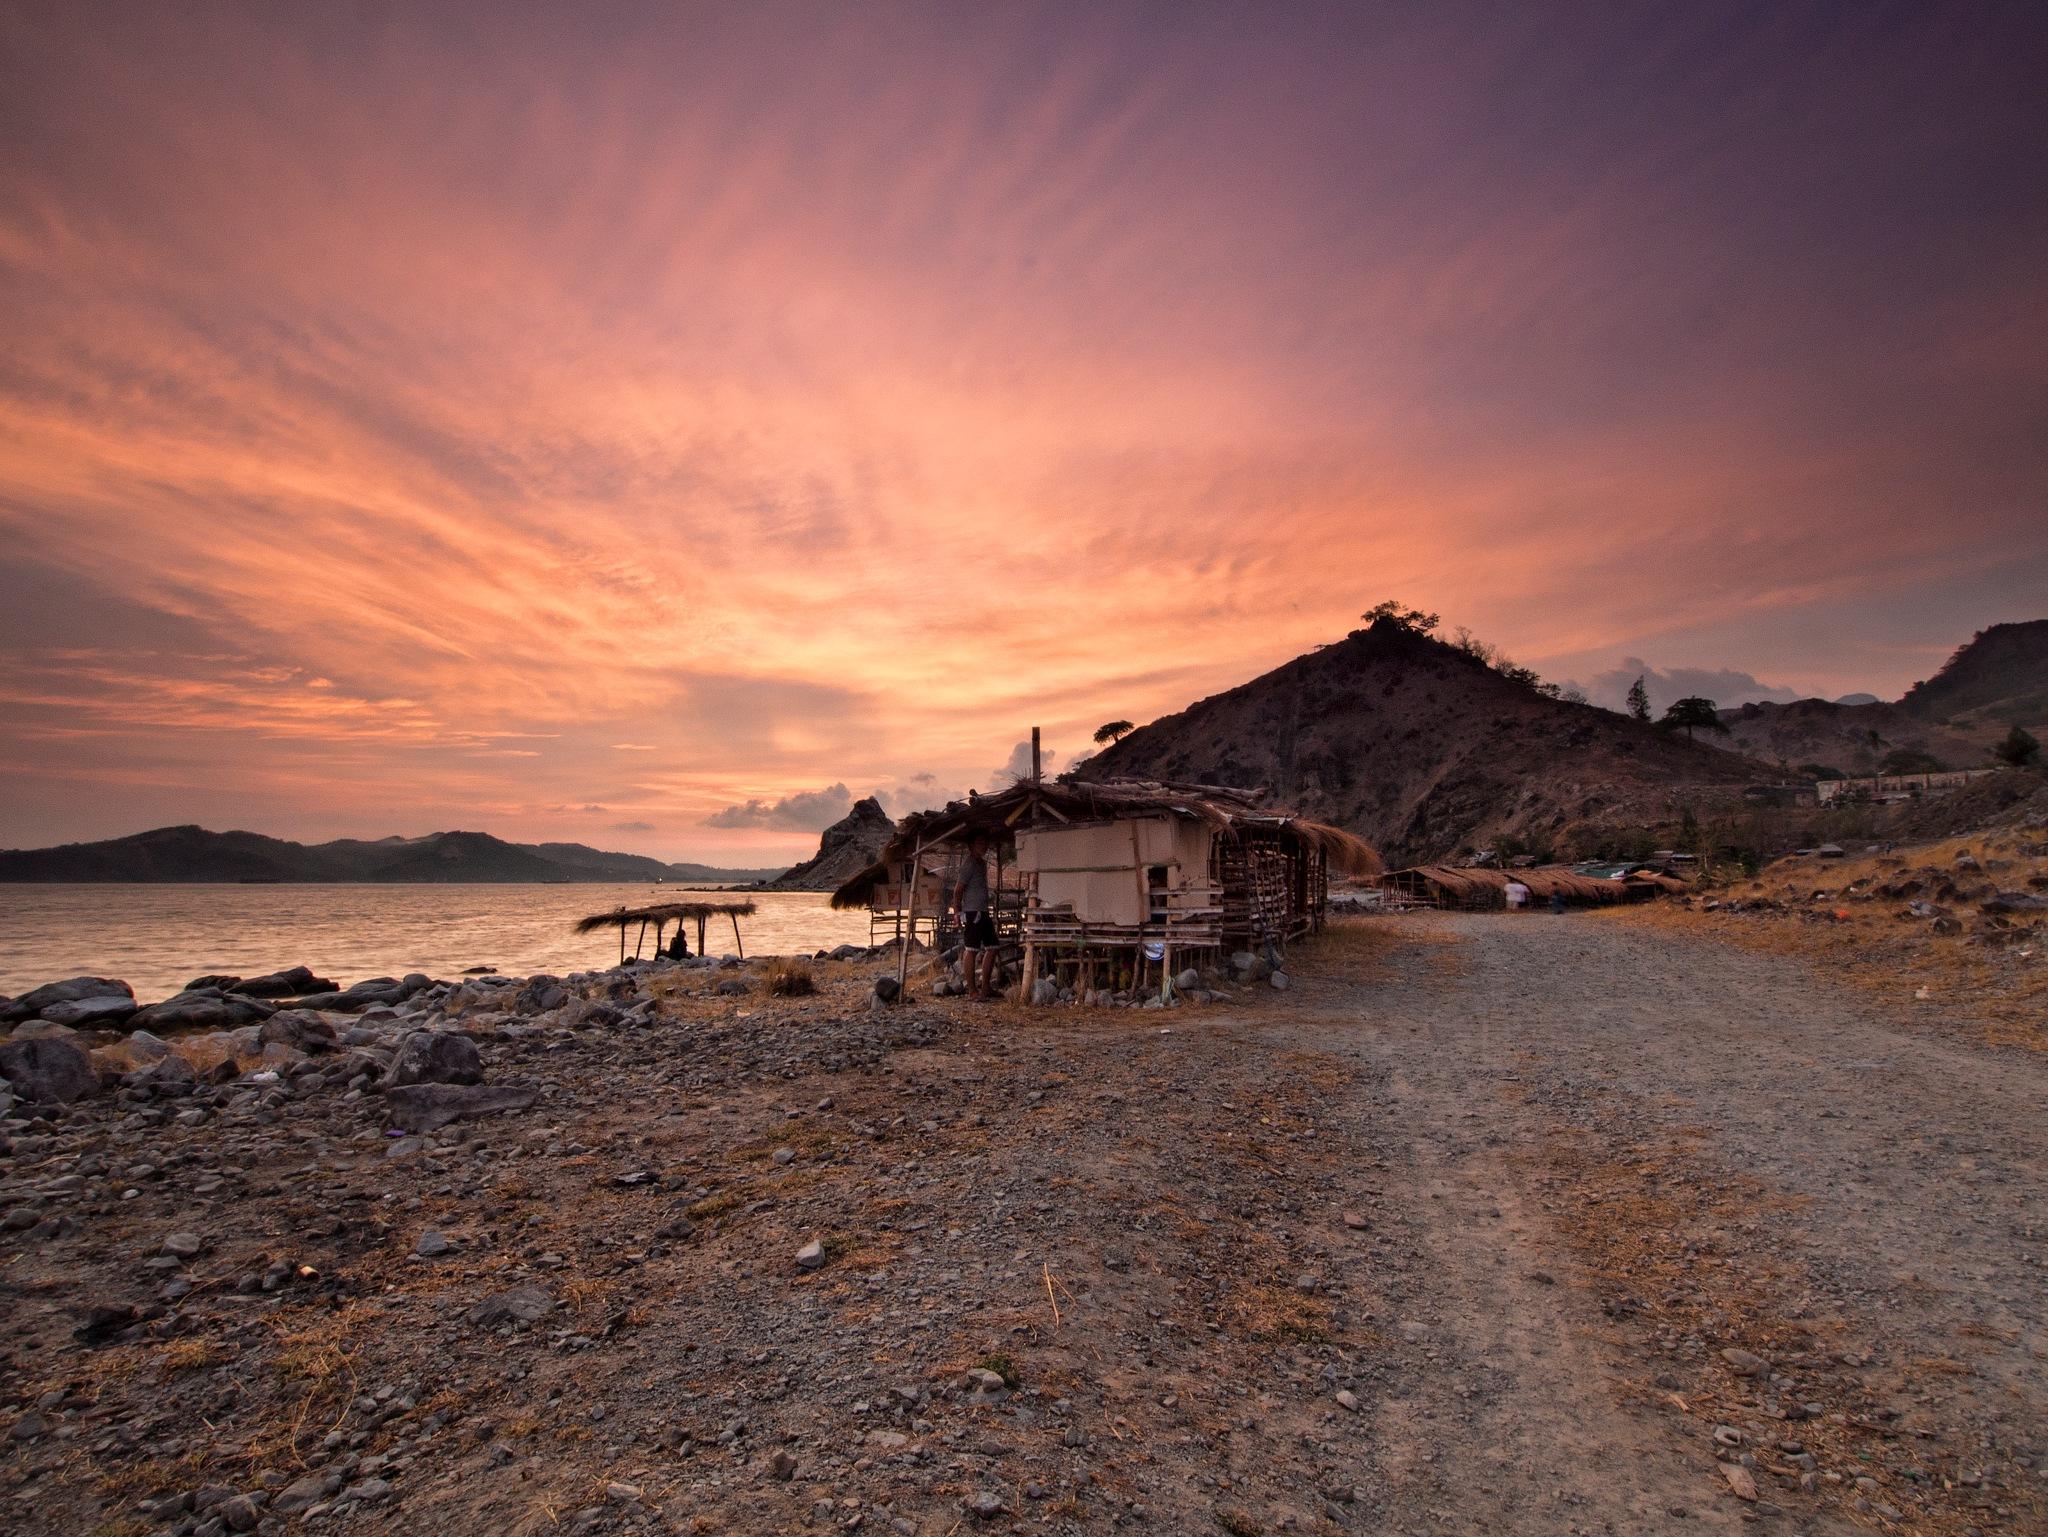 Sunset at Sisiman Bay, Mariveles, Bataan, Philippines by KurtzOrtiz